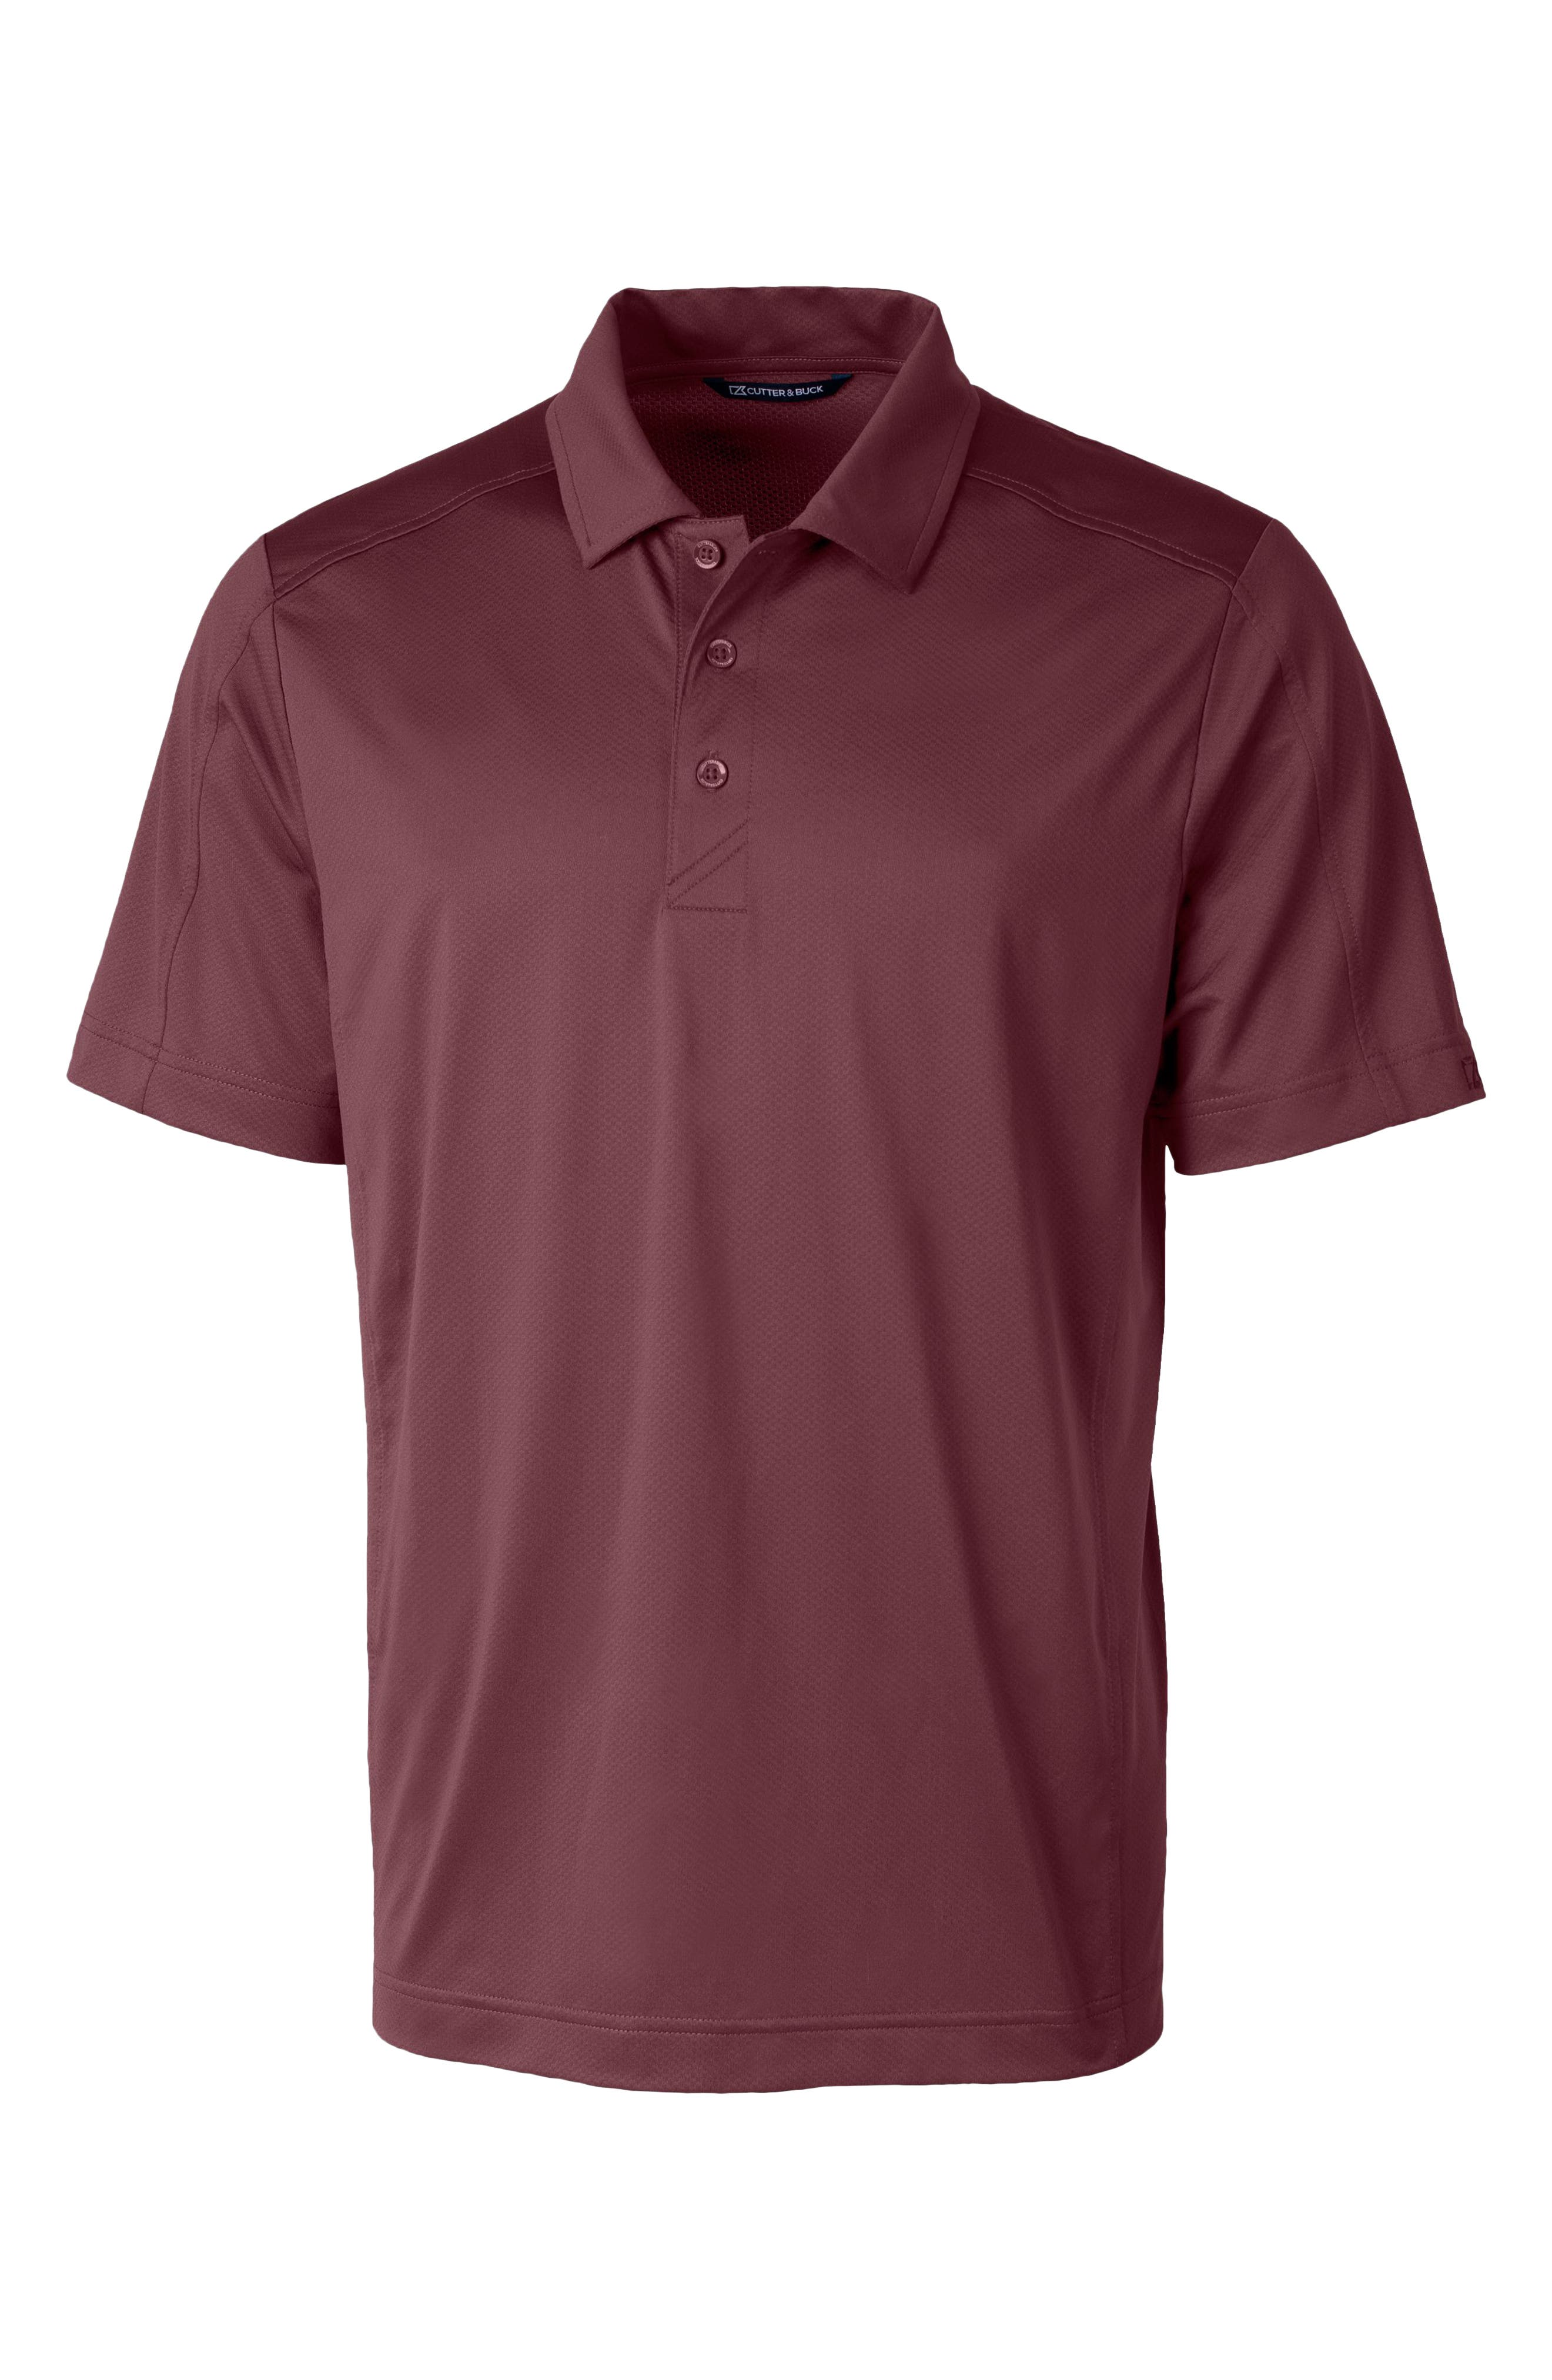 Charcoal Oregon Ducks NCAA Mens Birdie Short Sleeve Polo Shirt